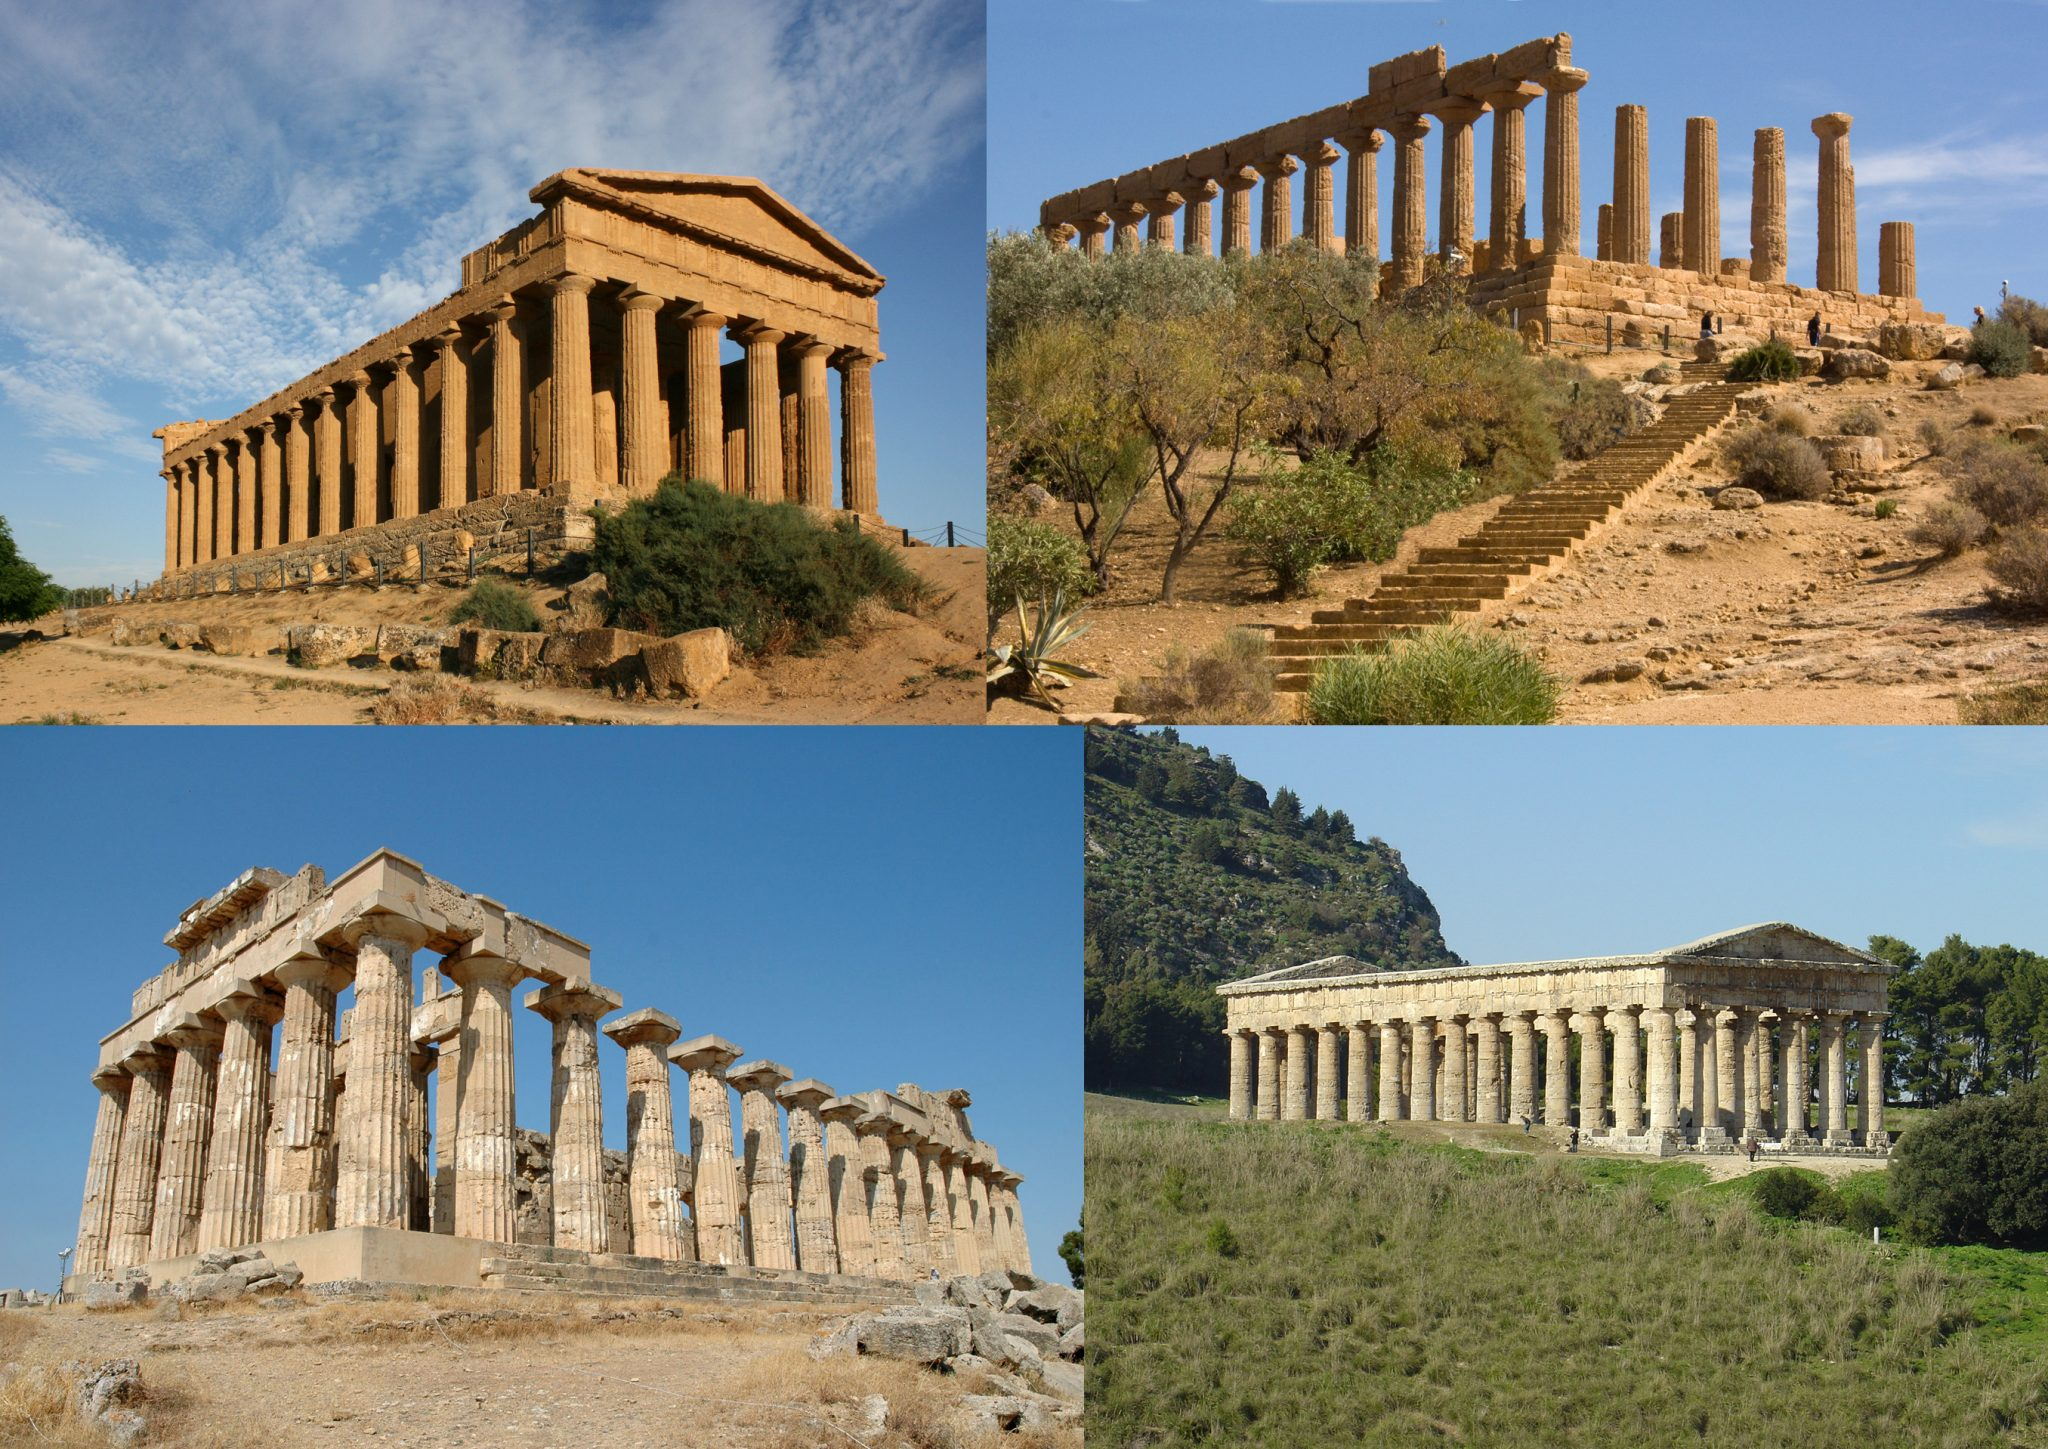 visitar sicilia en siete dias